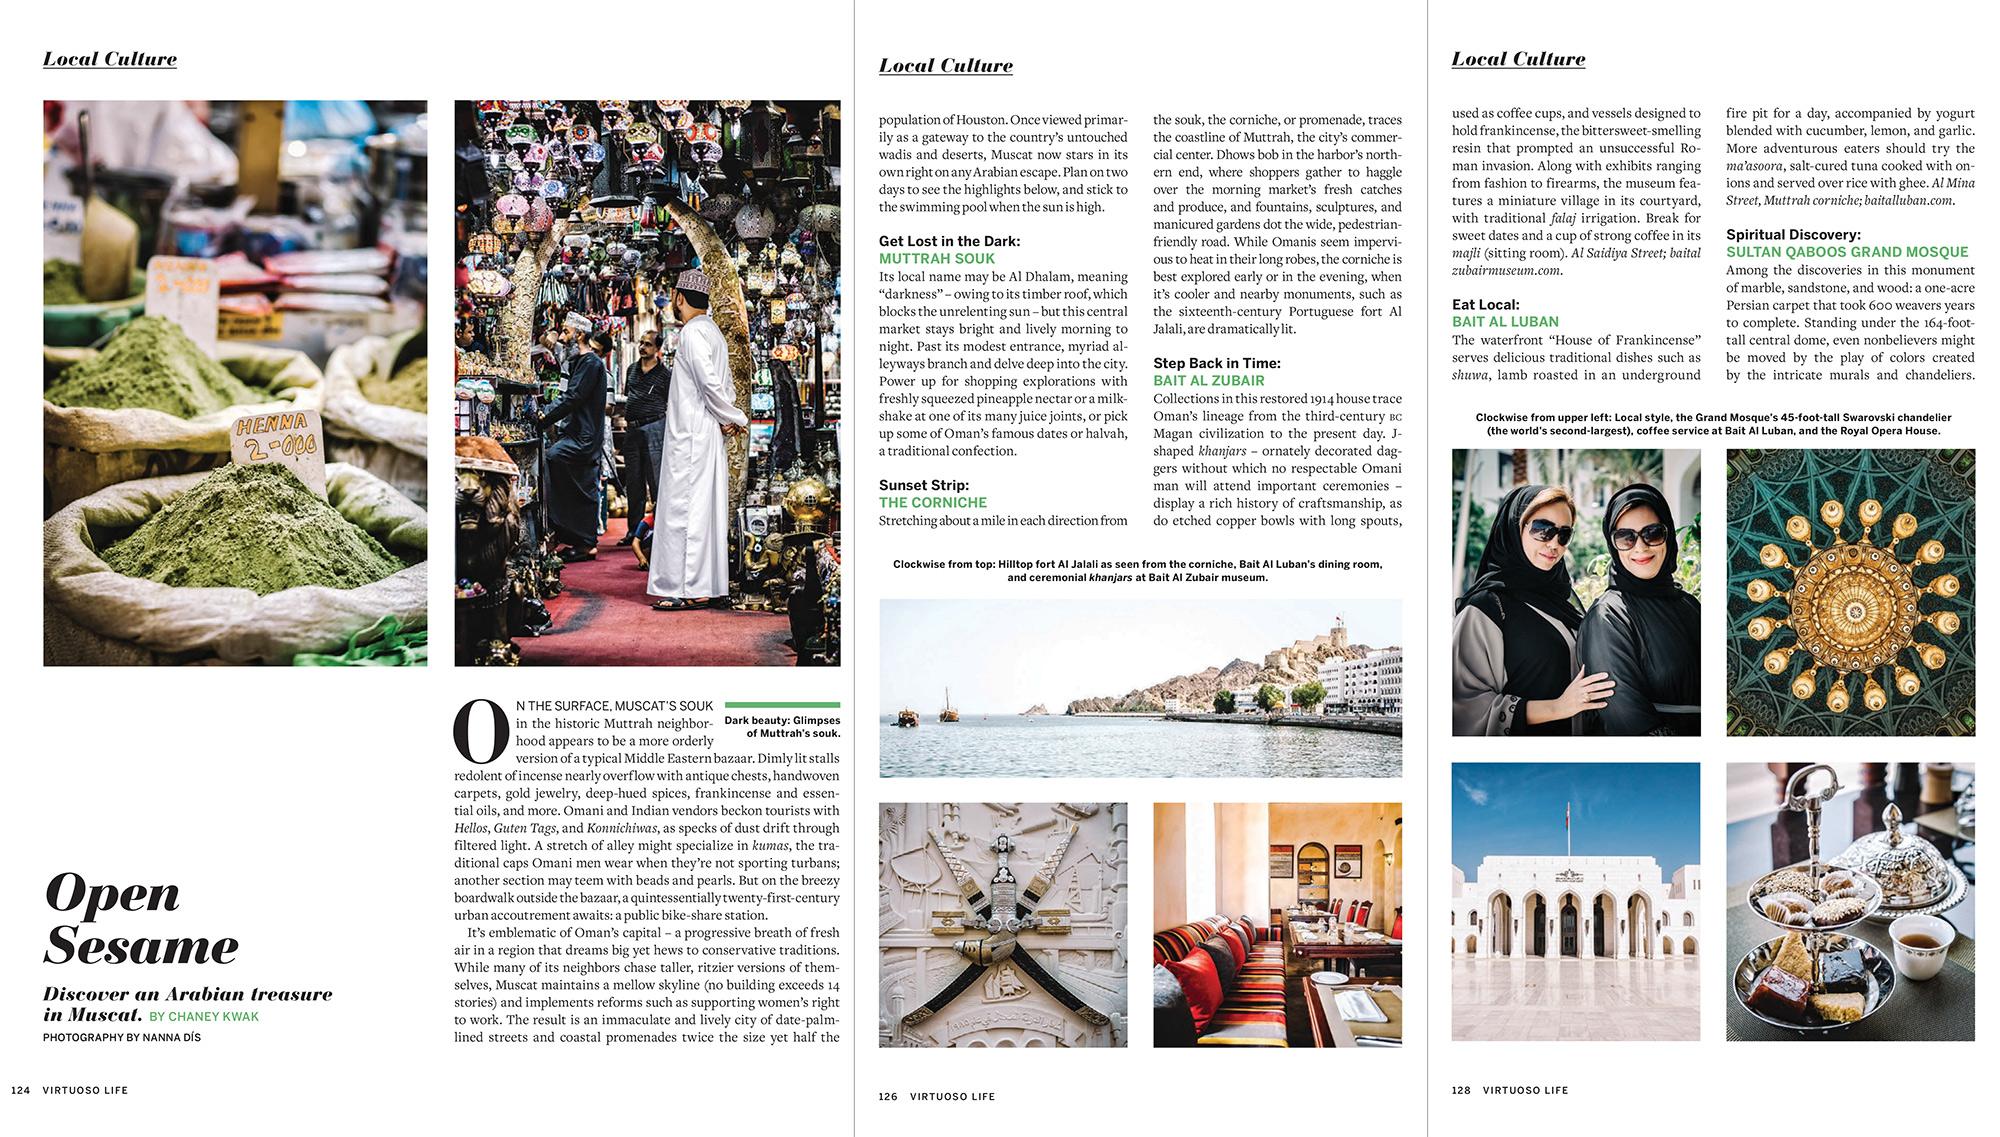 virtuosolife_publication_Muscat_Oman_20160708-117.jpg